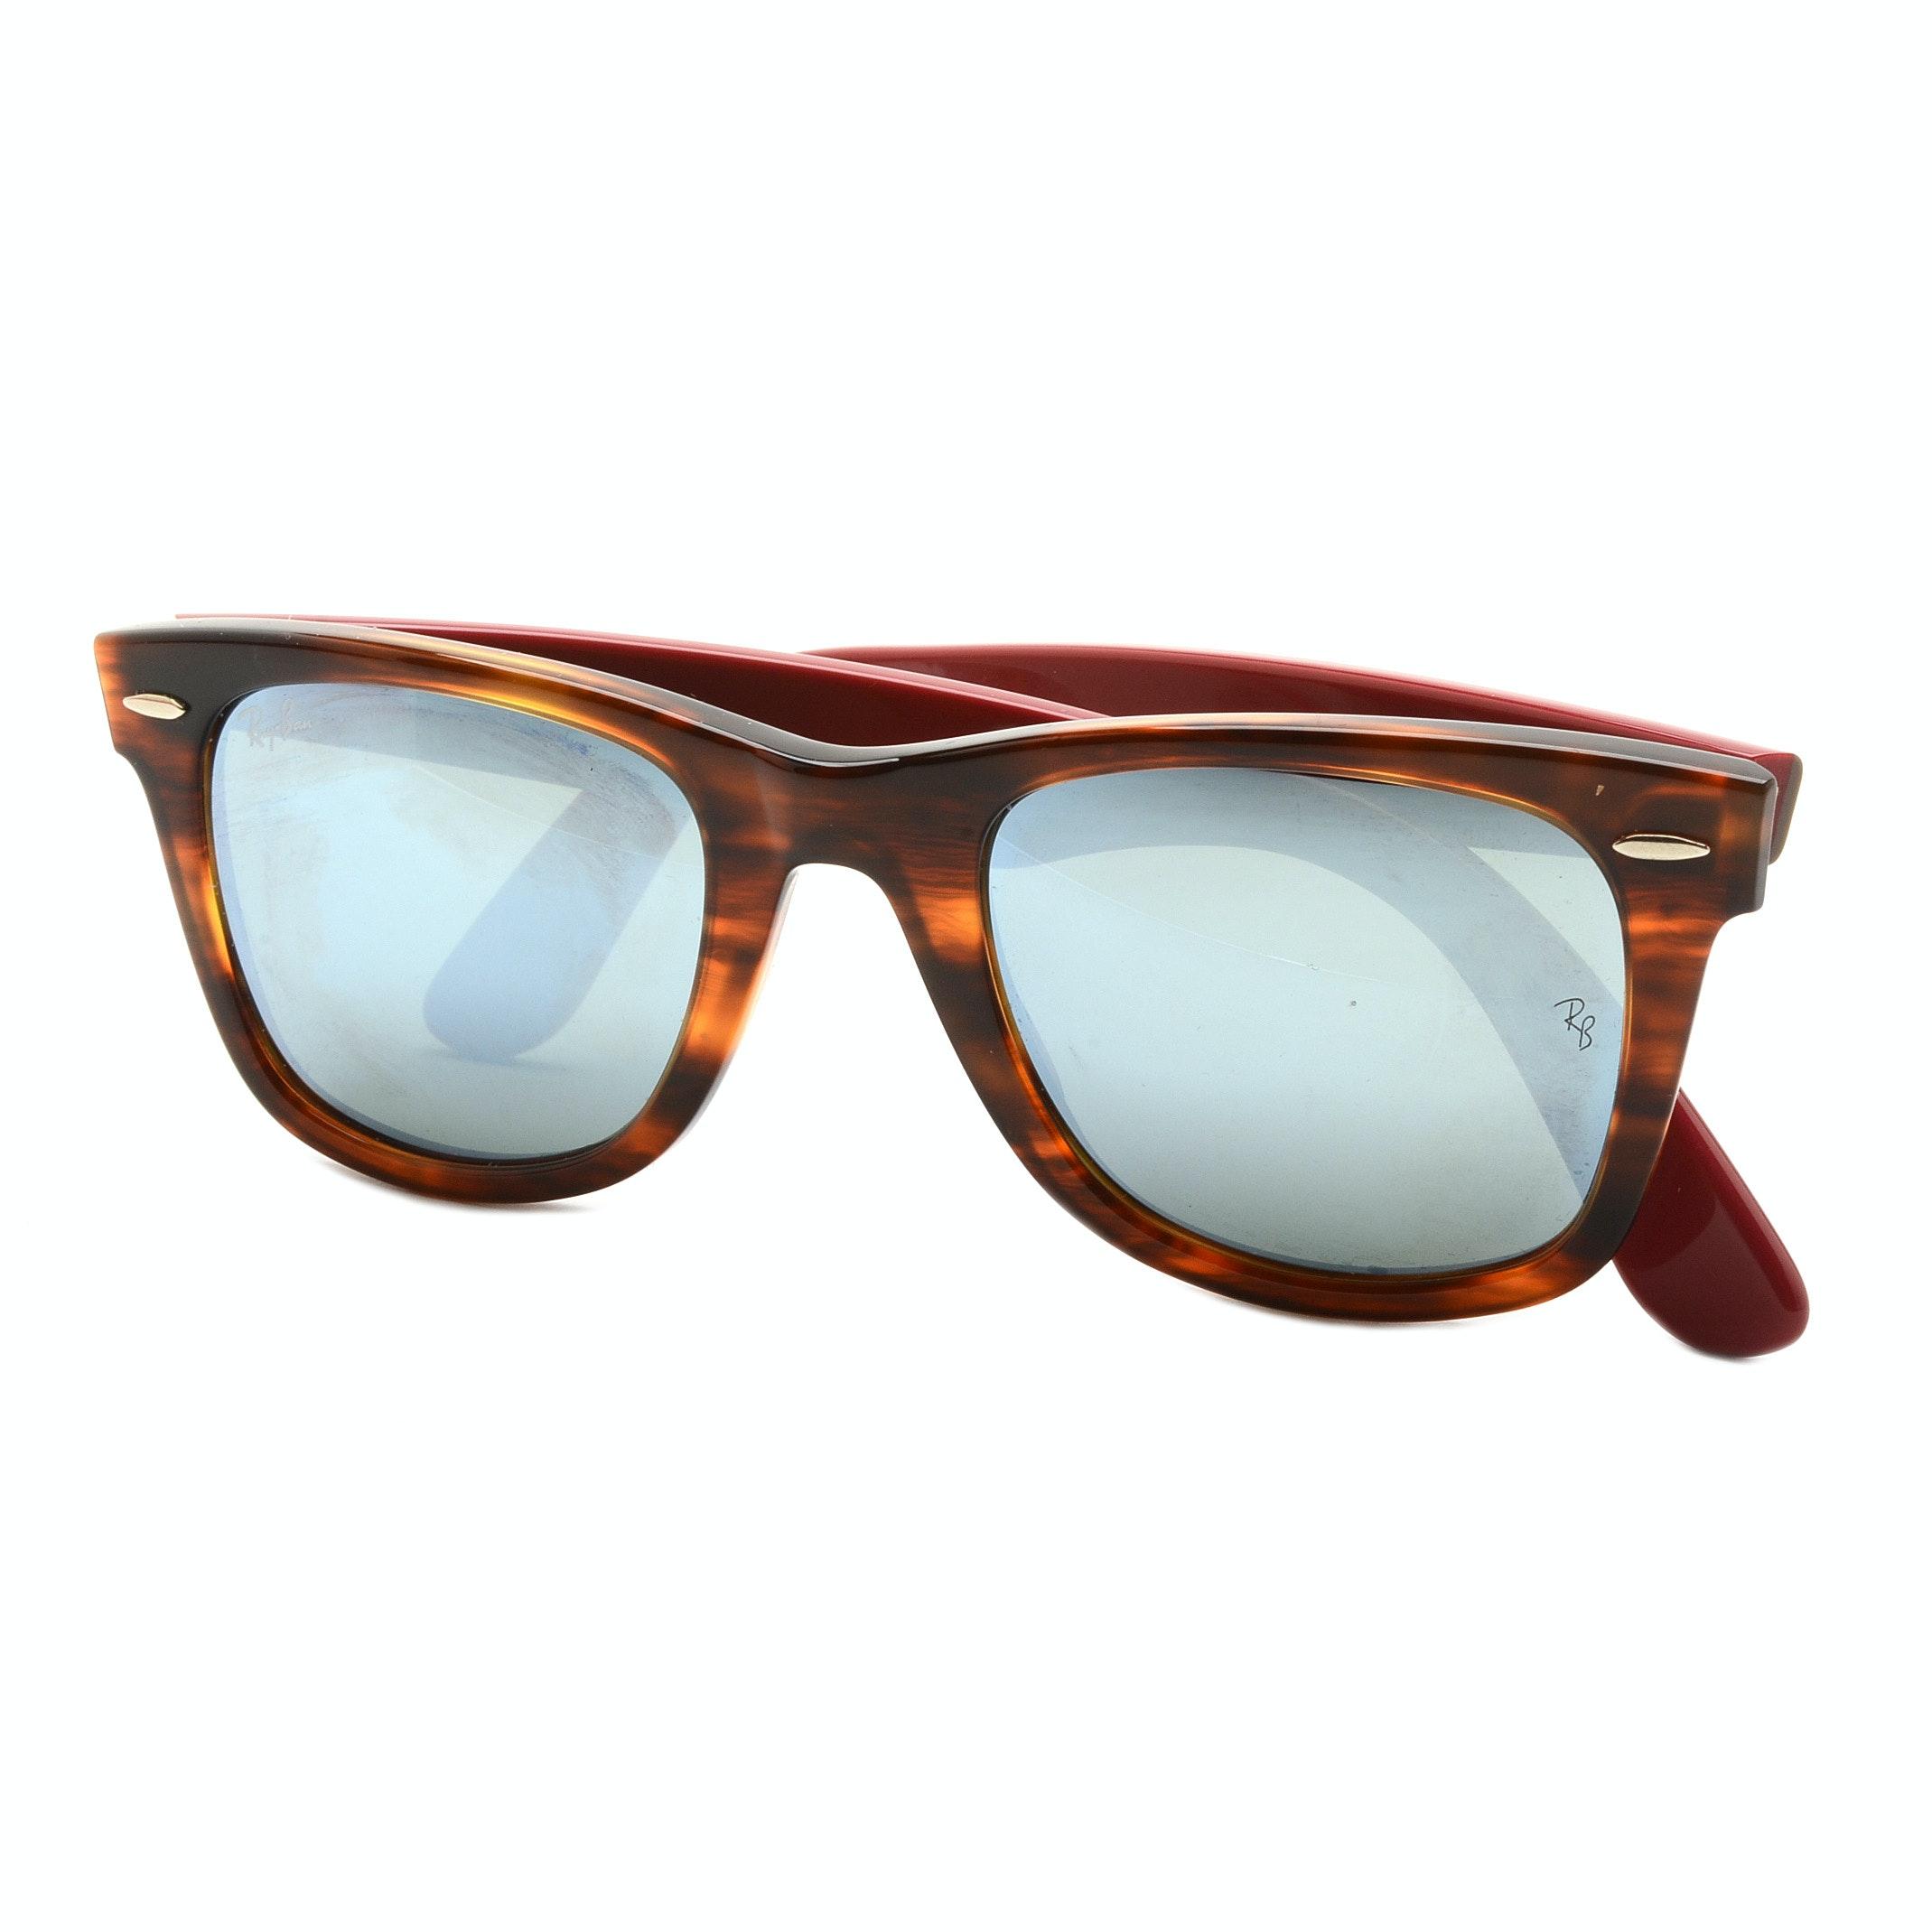 "Ray-Ban ""Wayfarer"" Sunglasses"